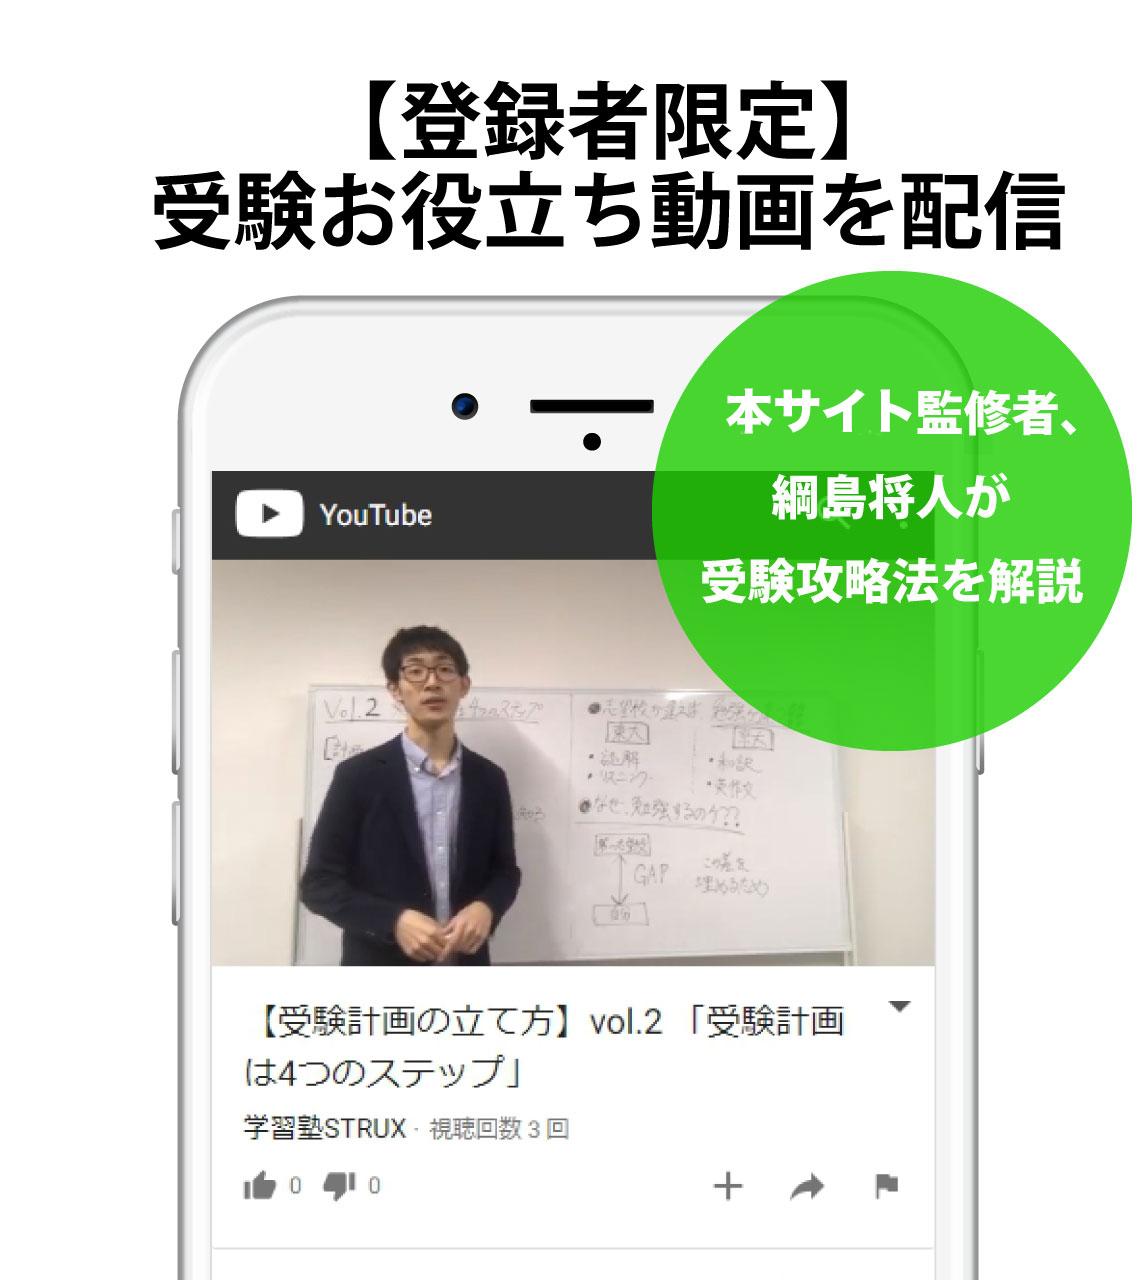 line@限定動画